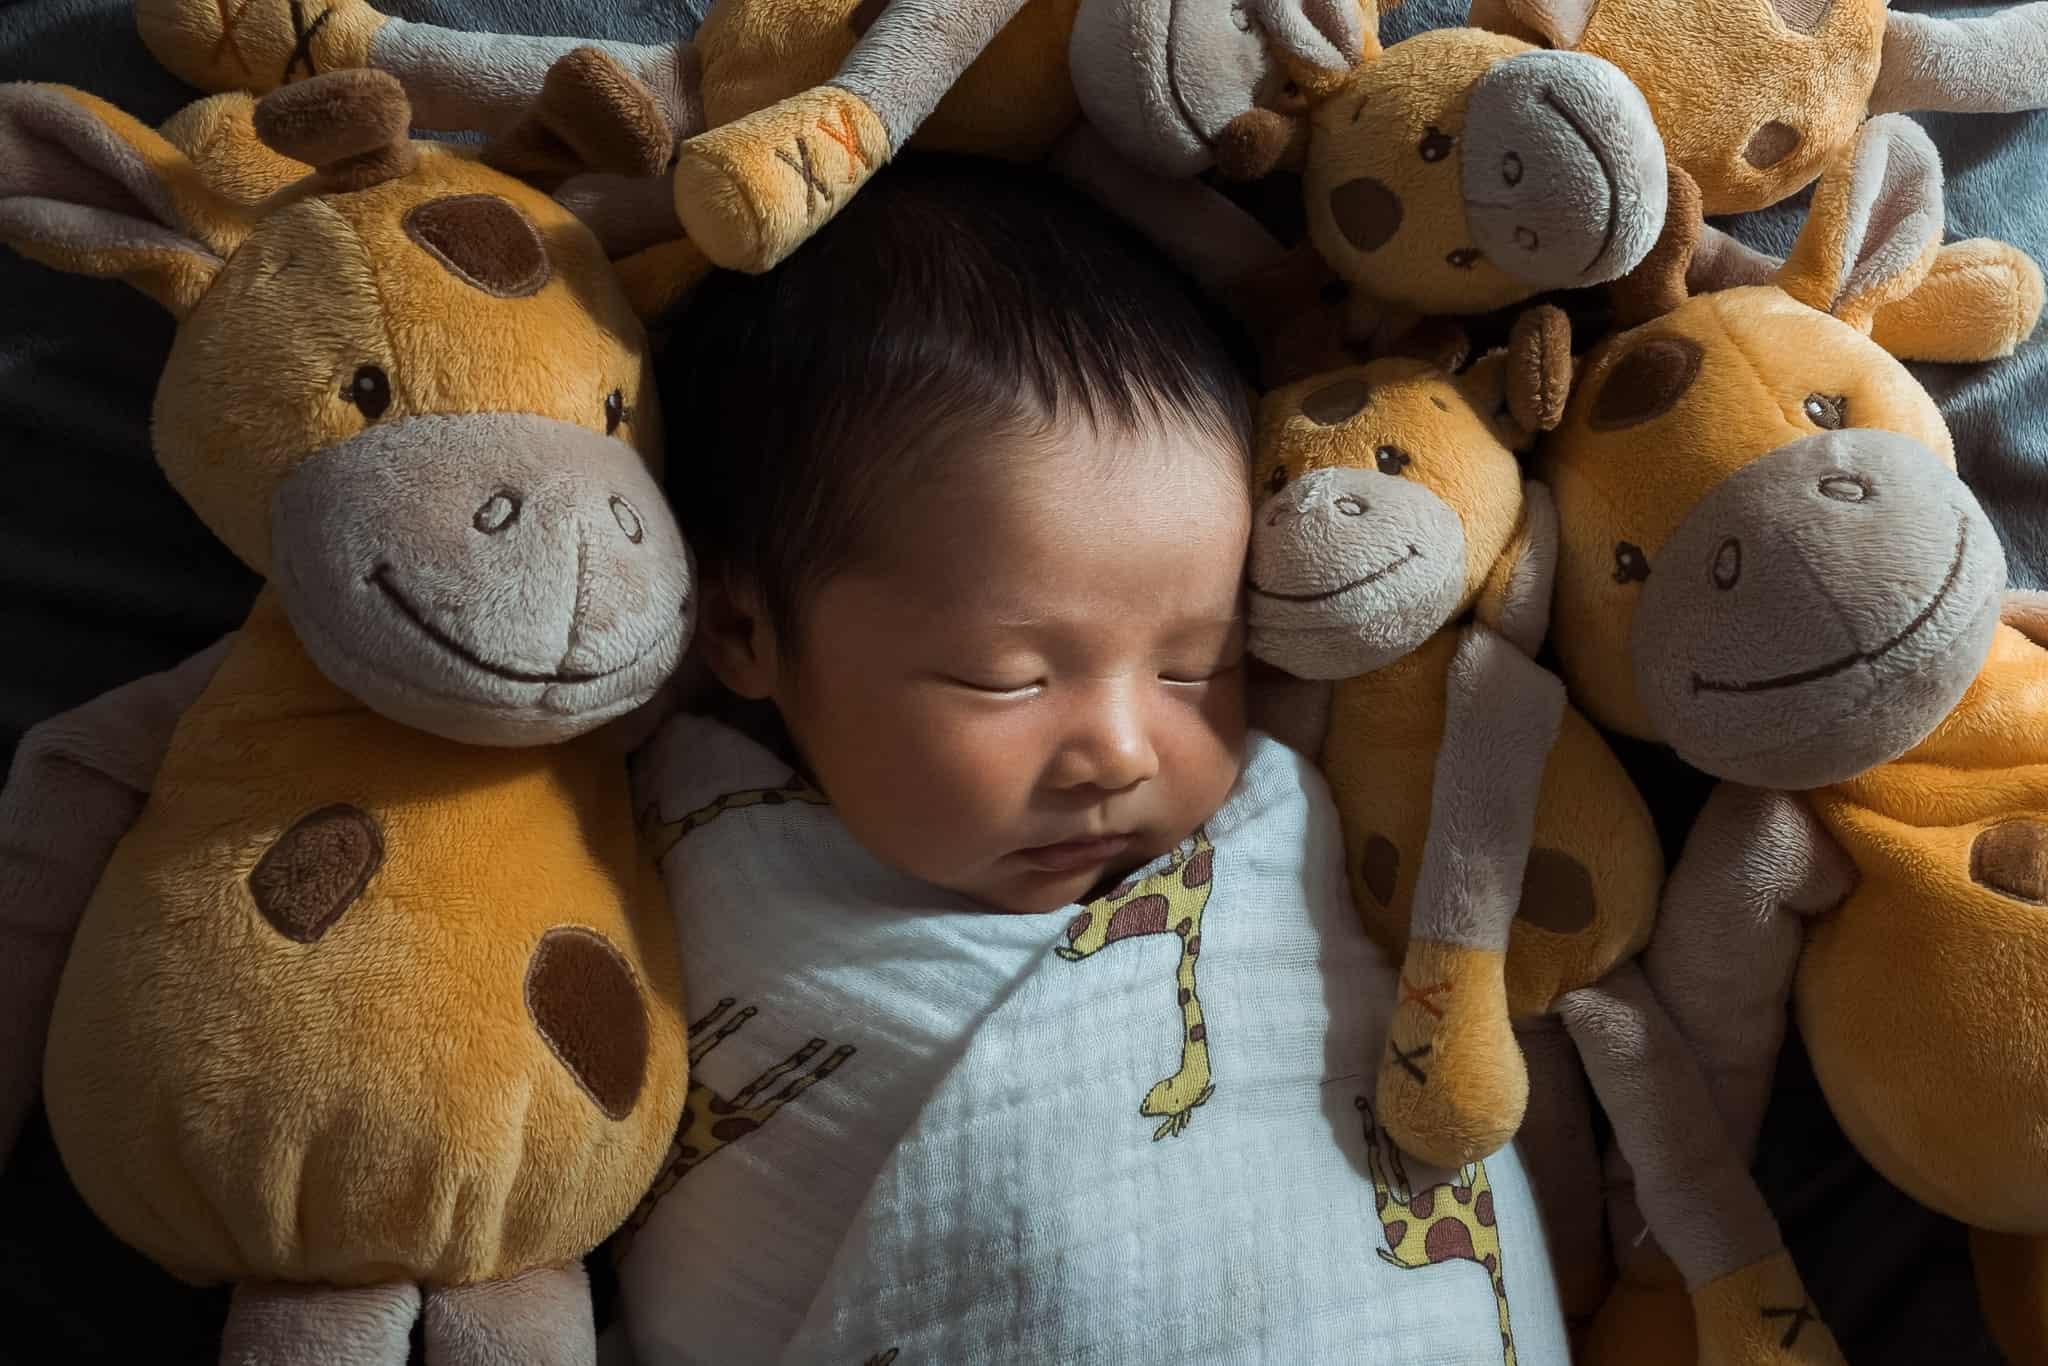 newborn baby swaddled with stuffed giraffes